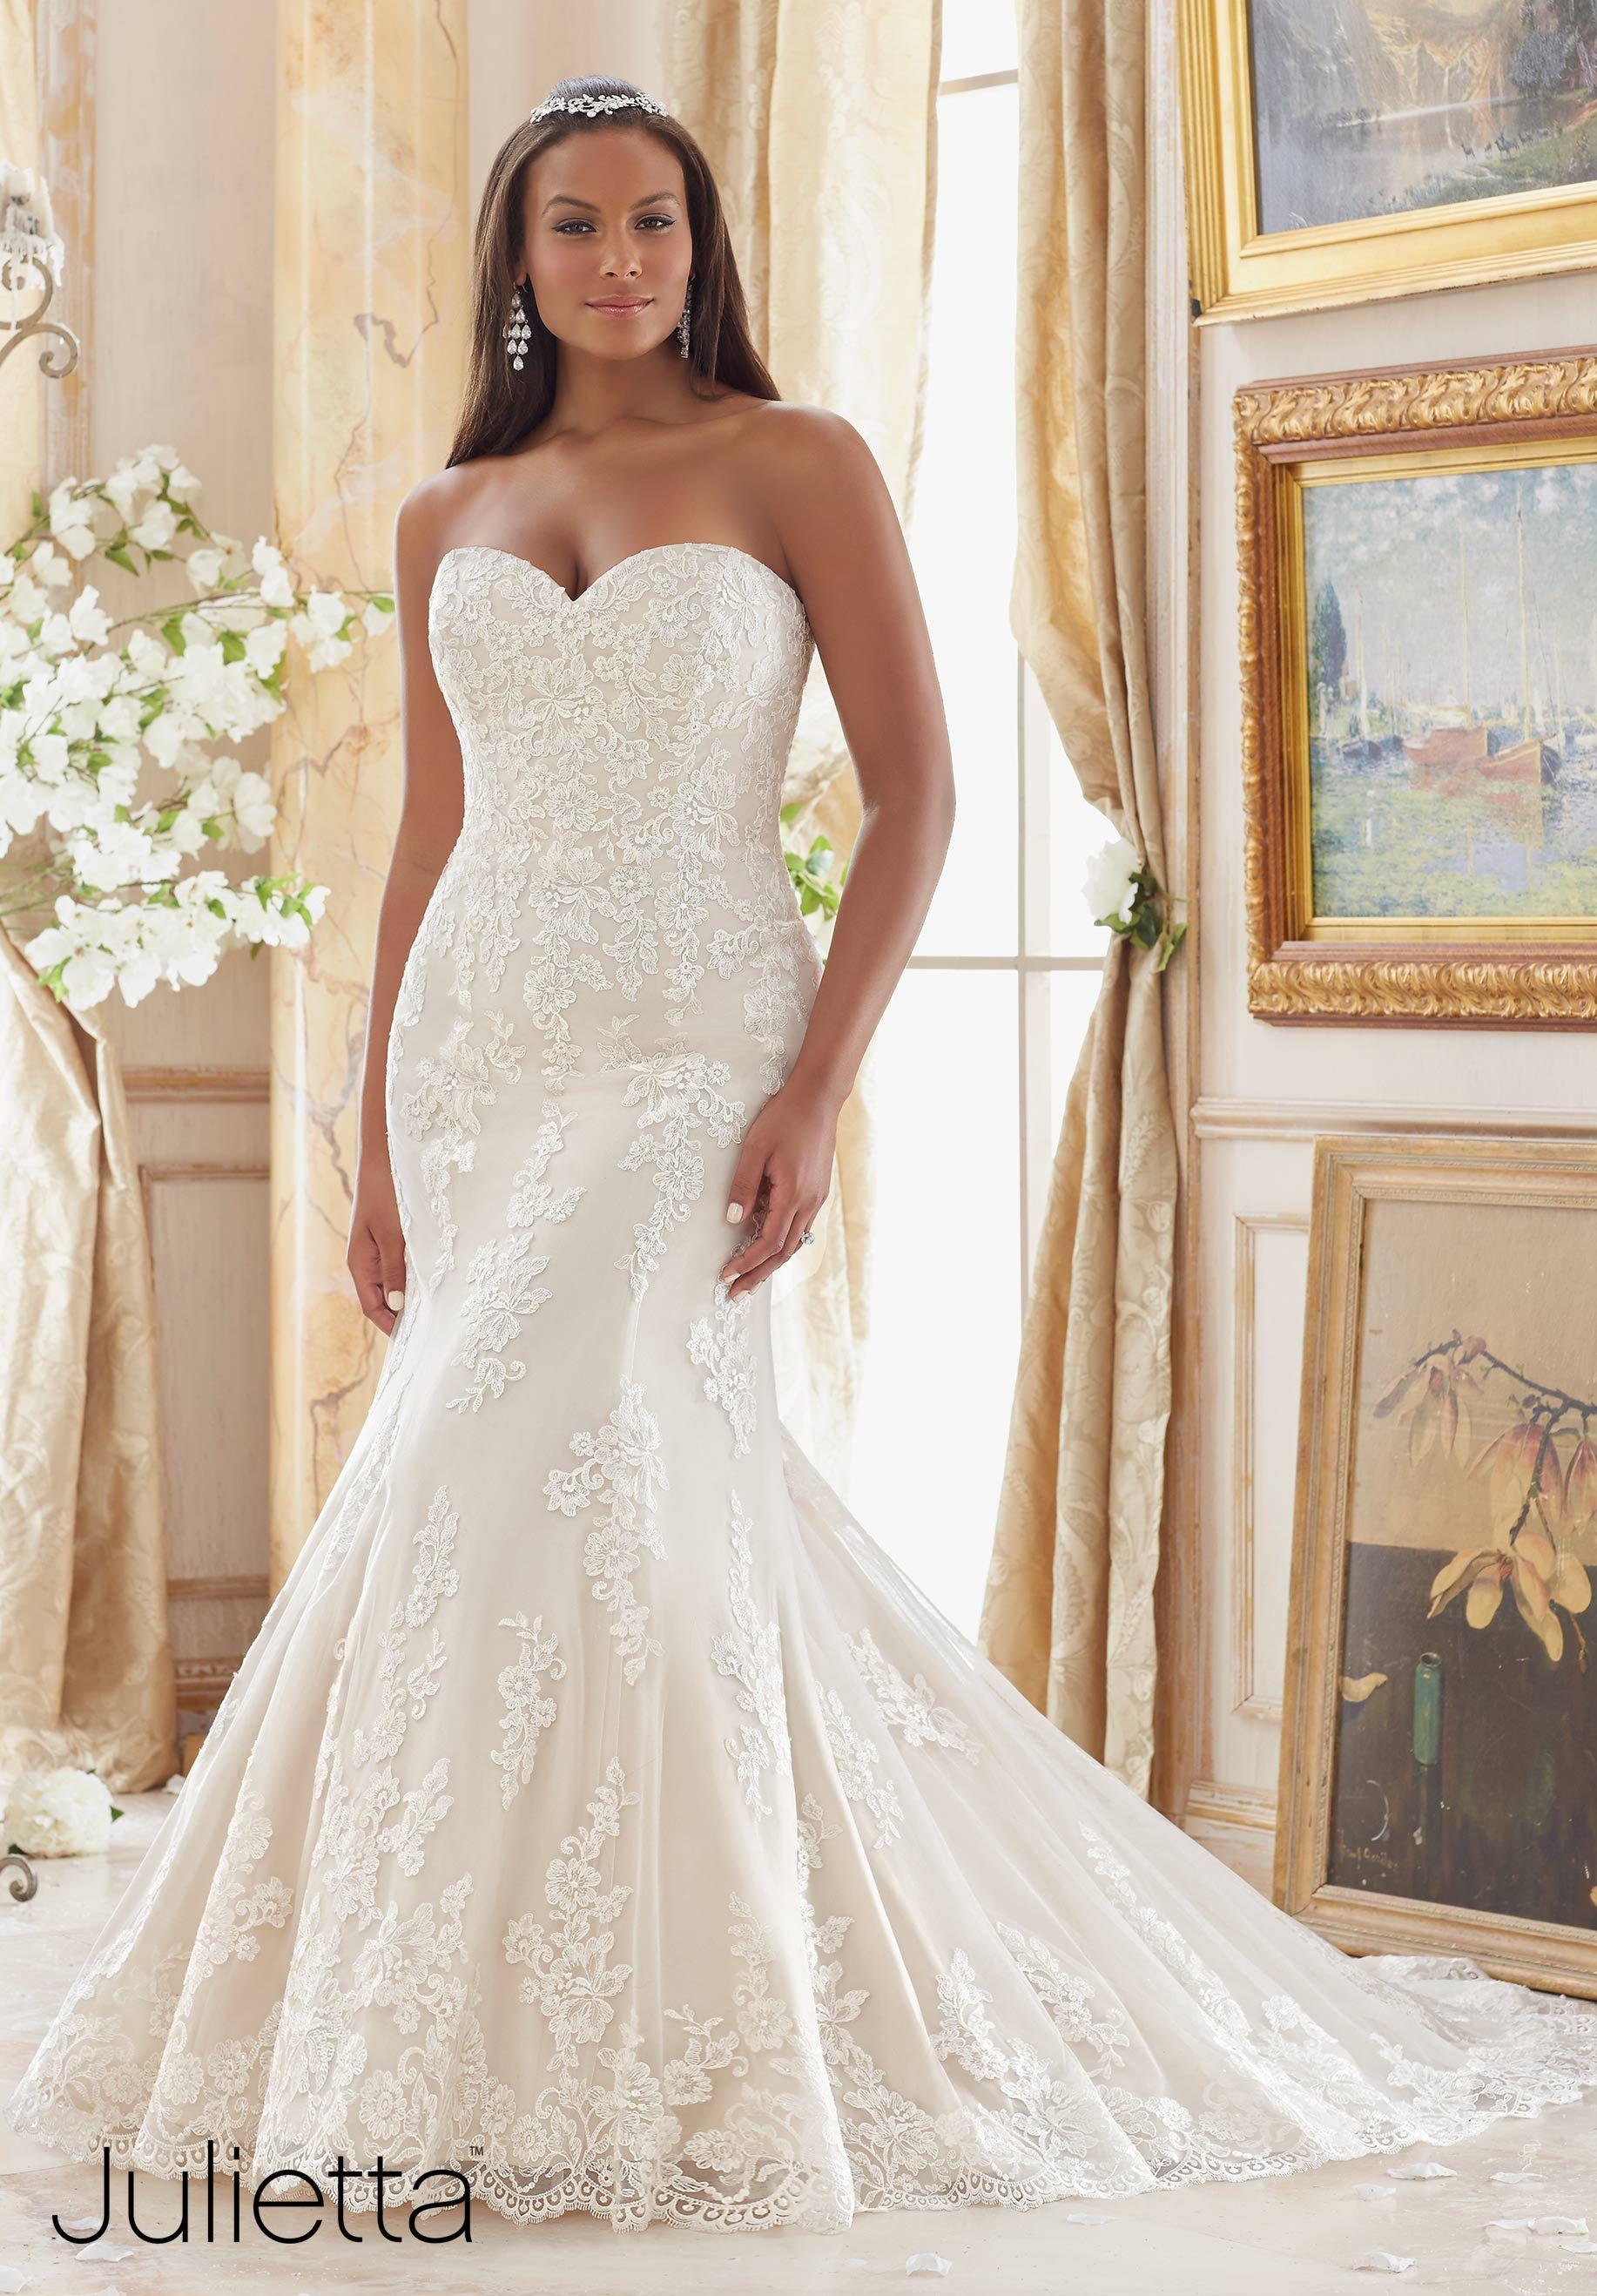 Plus Size Wedding Plus Size Wedding Gowns Mori Lee Julietta Collection Pretty Pear Bride Wedding Dress Brands Mori Lee Wedding Dress Wedding Dress Styles [ 2636 x 1834 Pixel ]